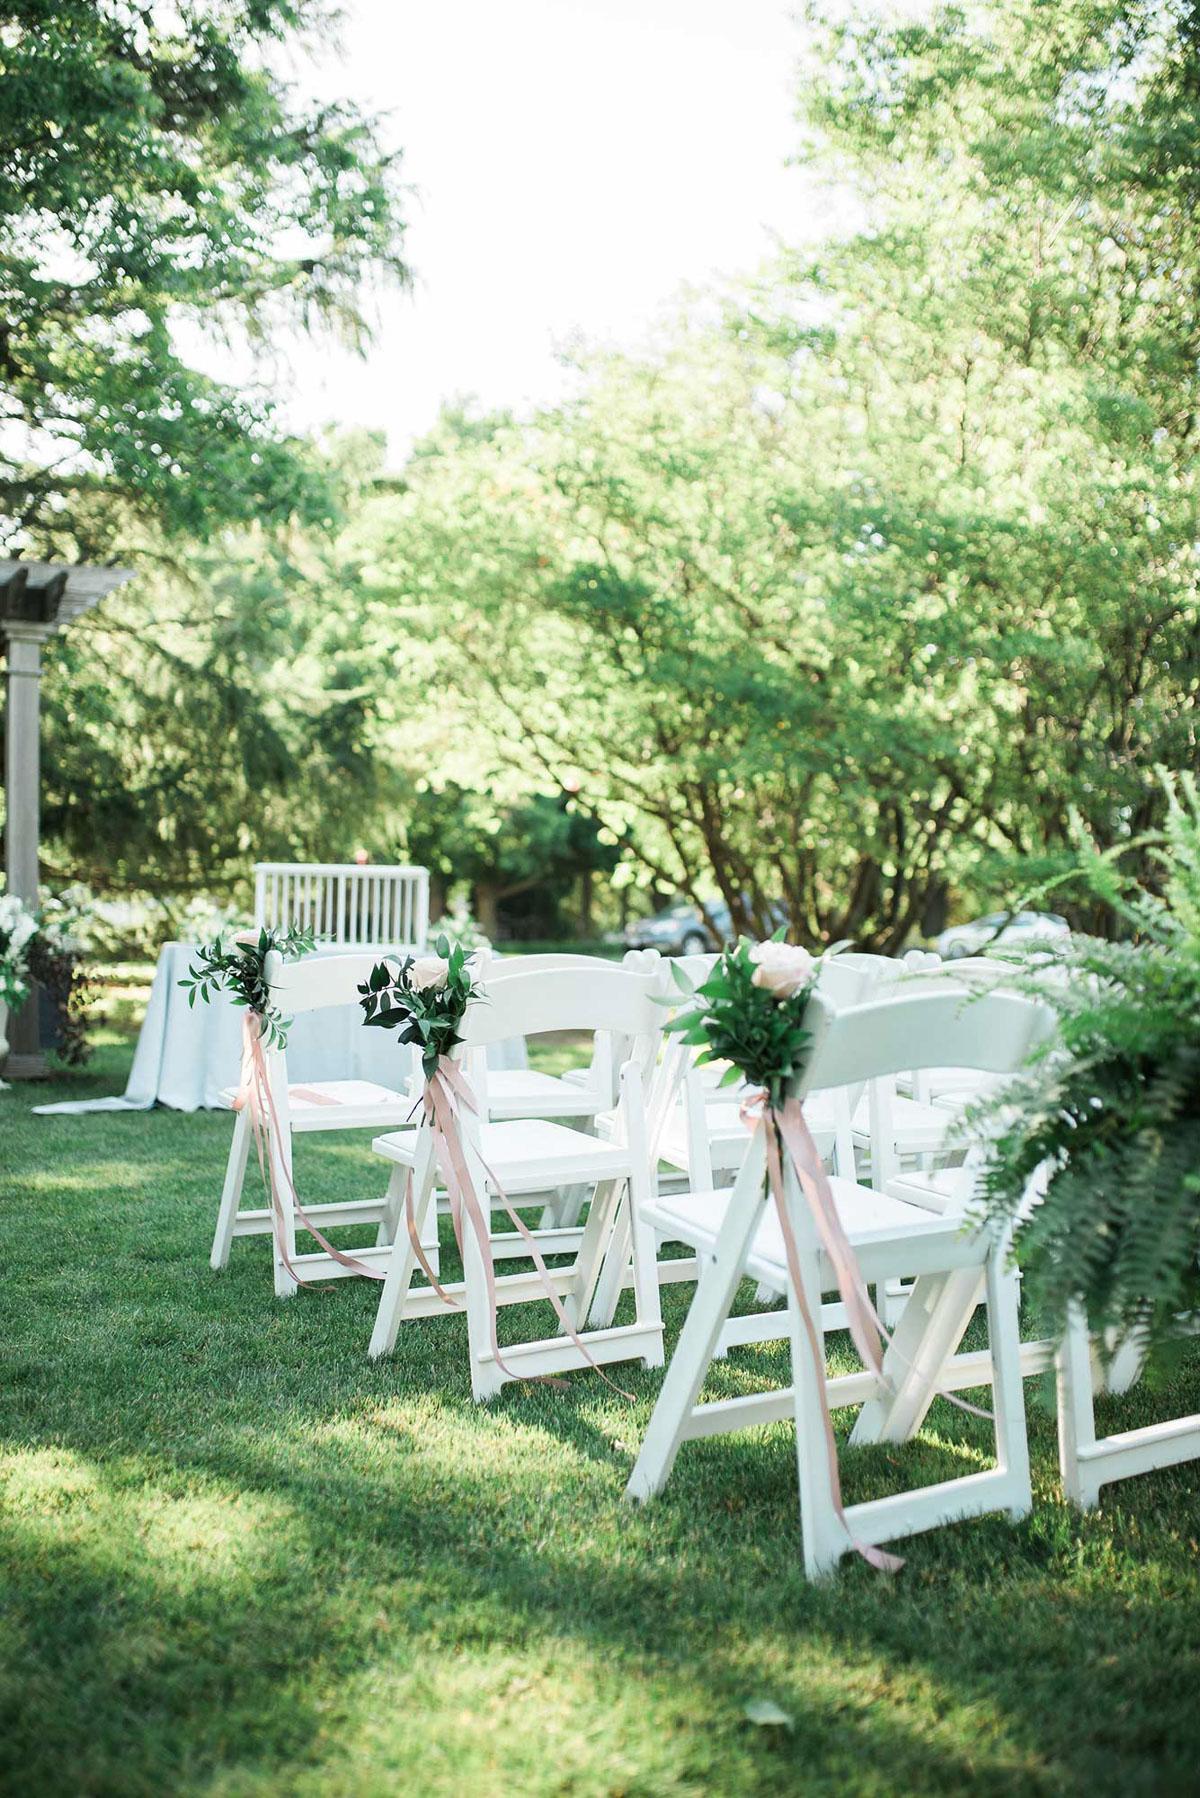 destiny-dawn-photography-vineyard-bride-swish-list-knollwood-golf-and-country-club-ancaster-wedding-editorial-11.jpg